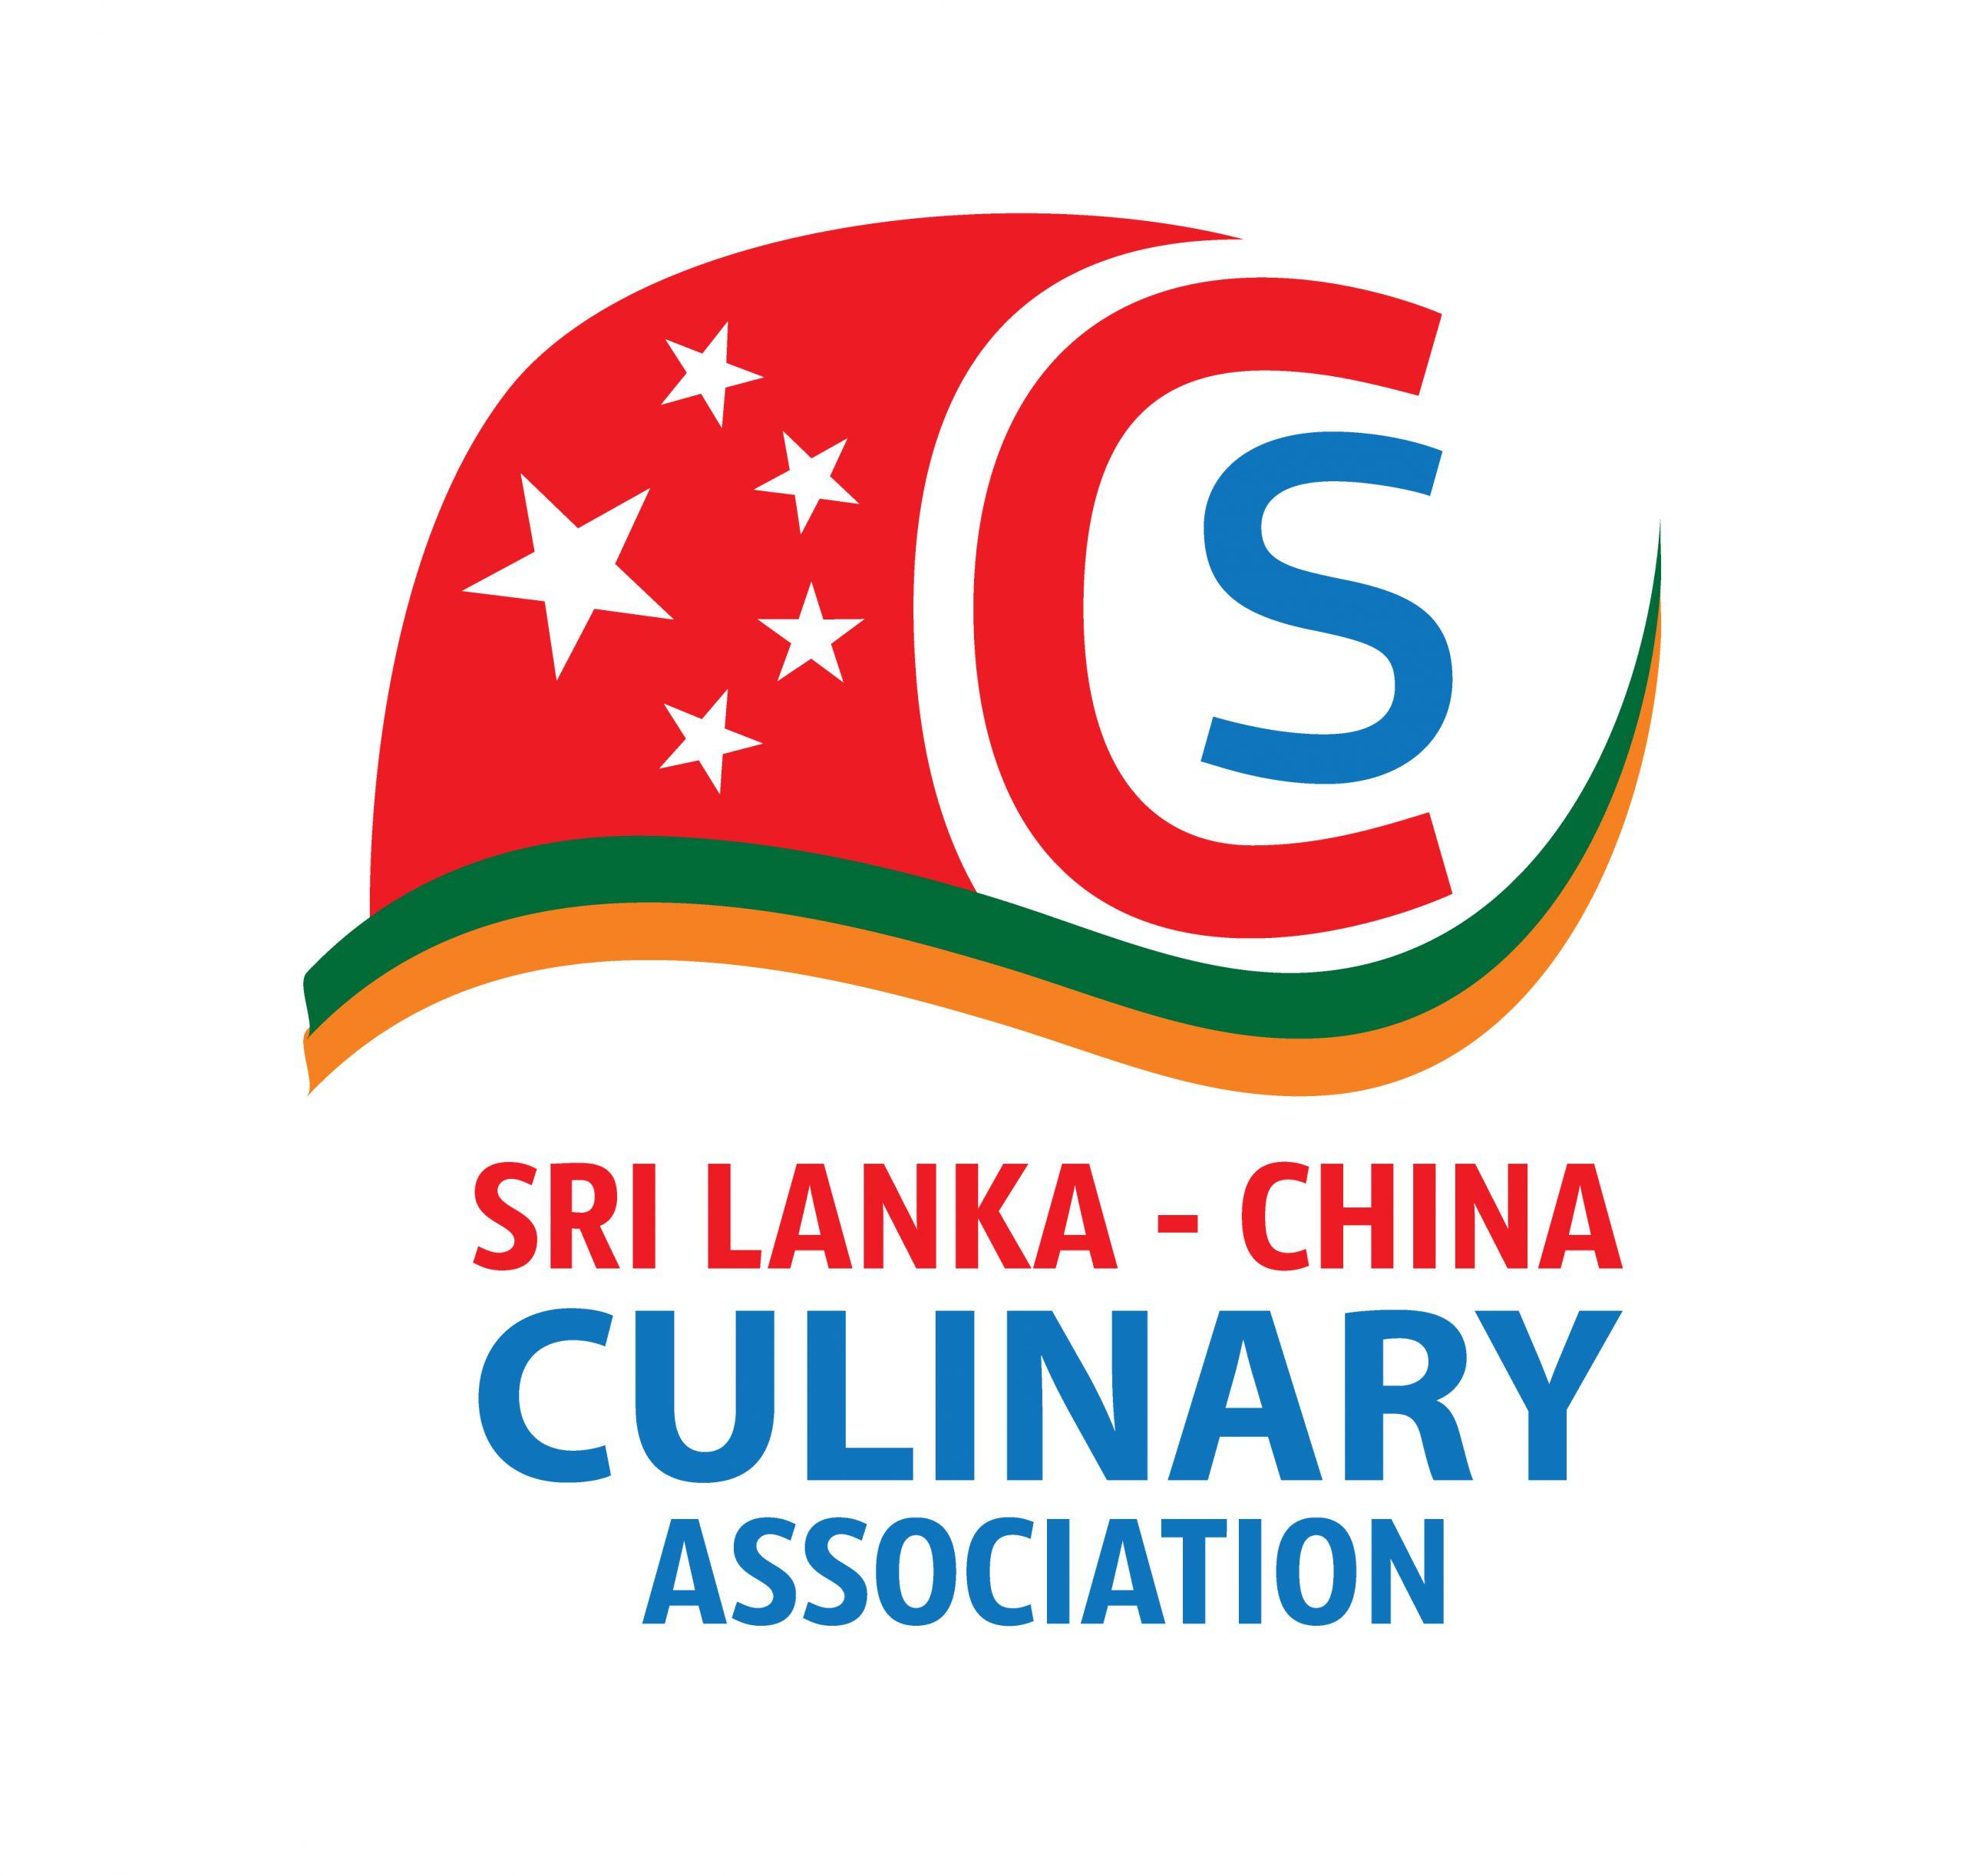 Sri Lanka - China Culinary Association